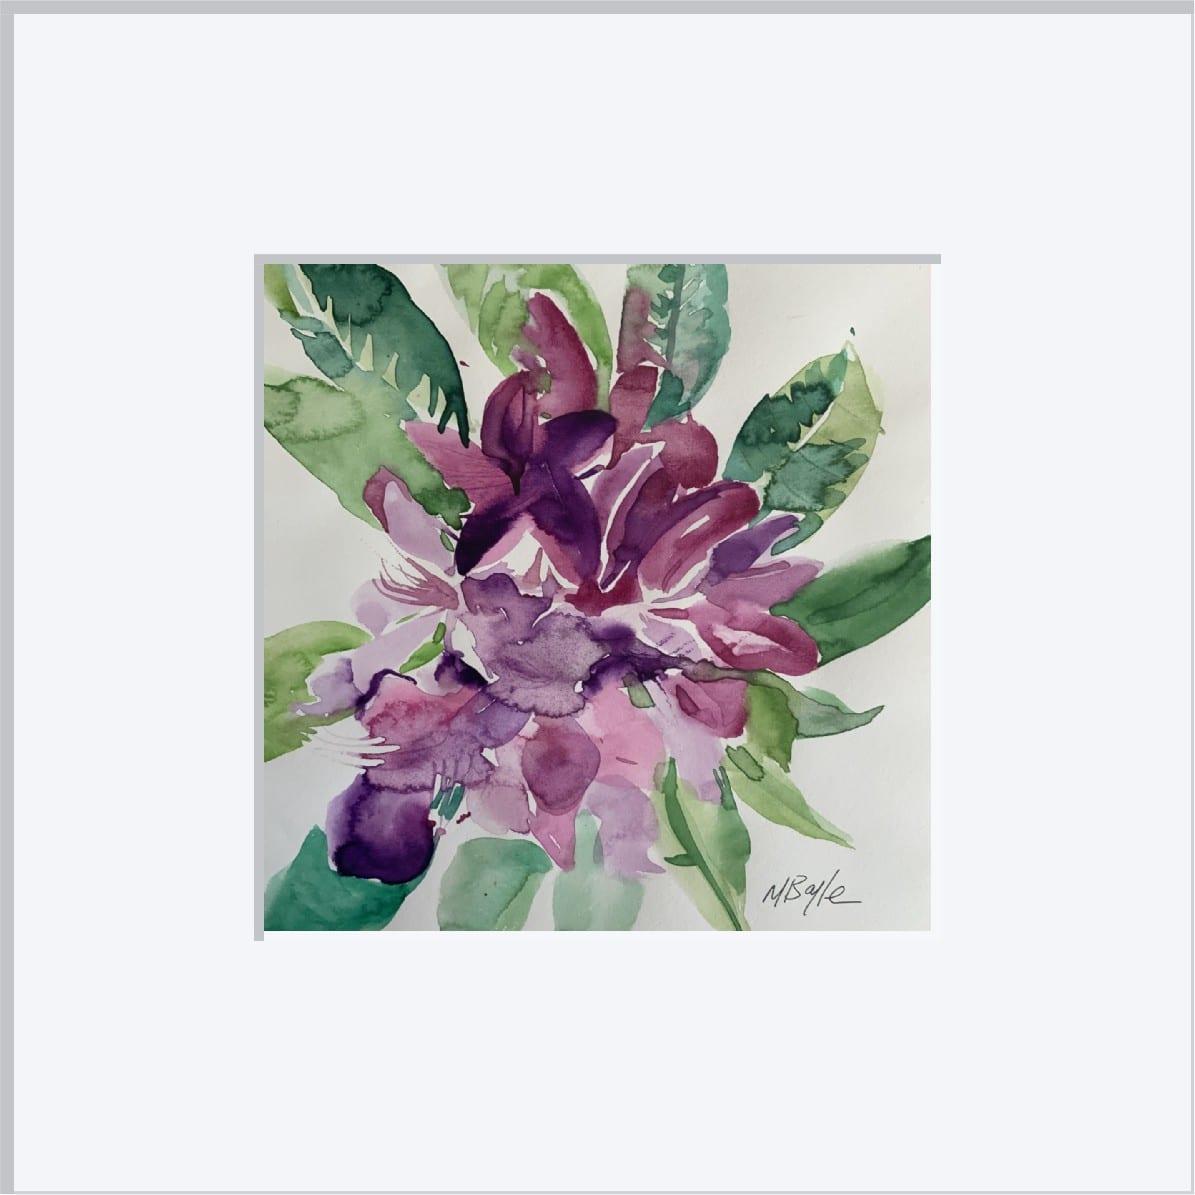 9 cm mountcard  with each 17 cm x 17 cm + sized artwork ( ready to fit est. frame size 33 cm x 33 cm +)